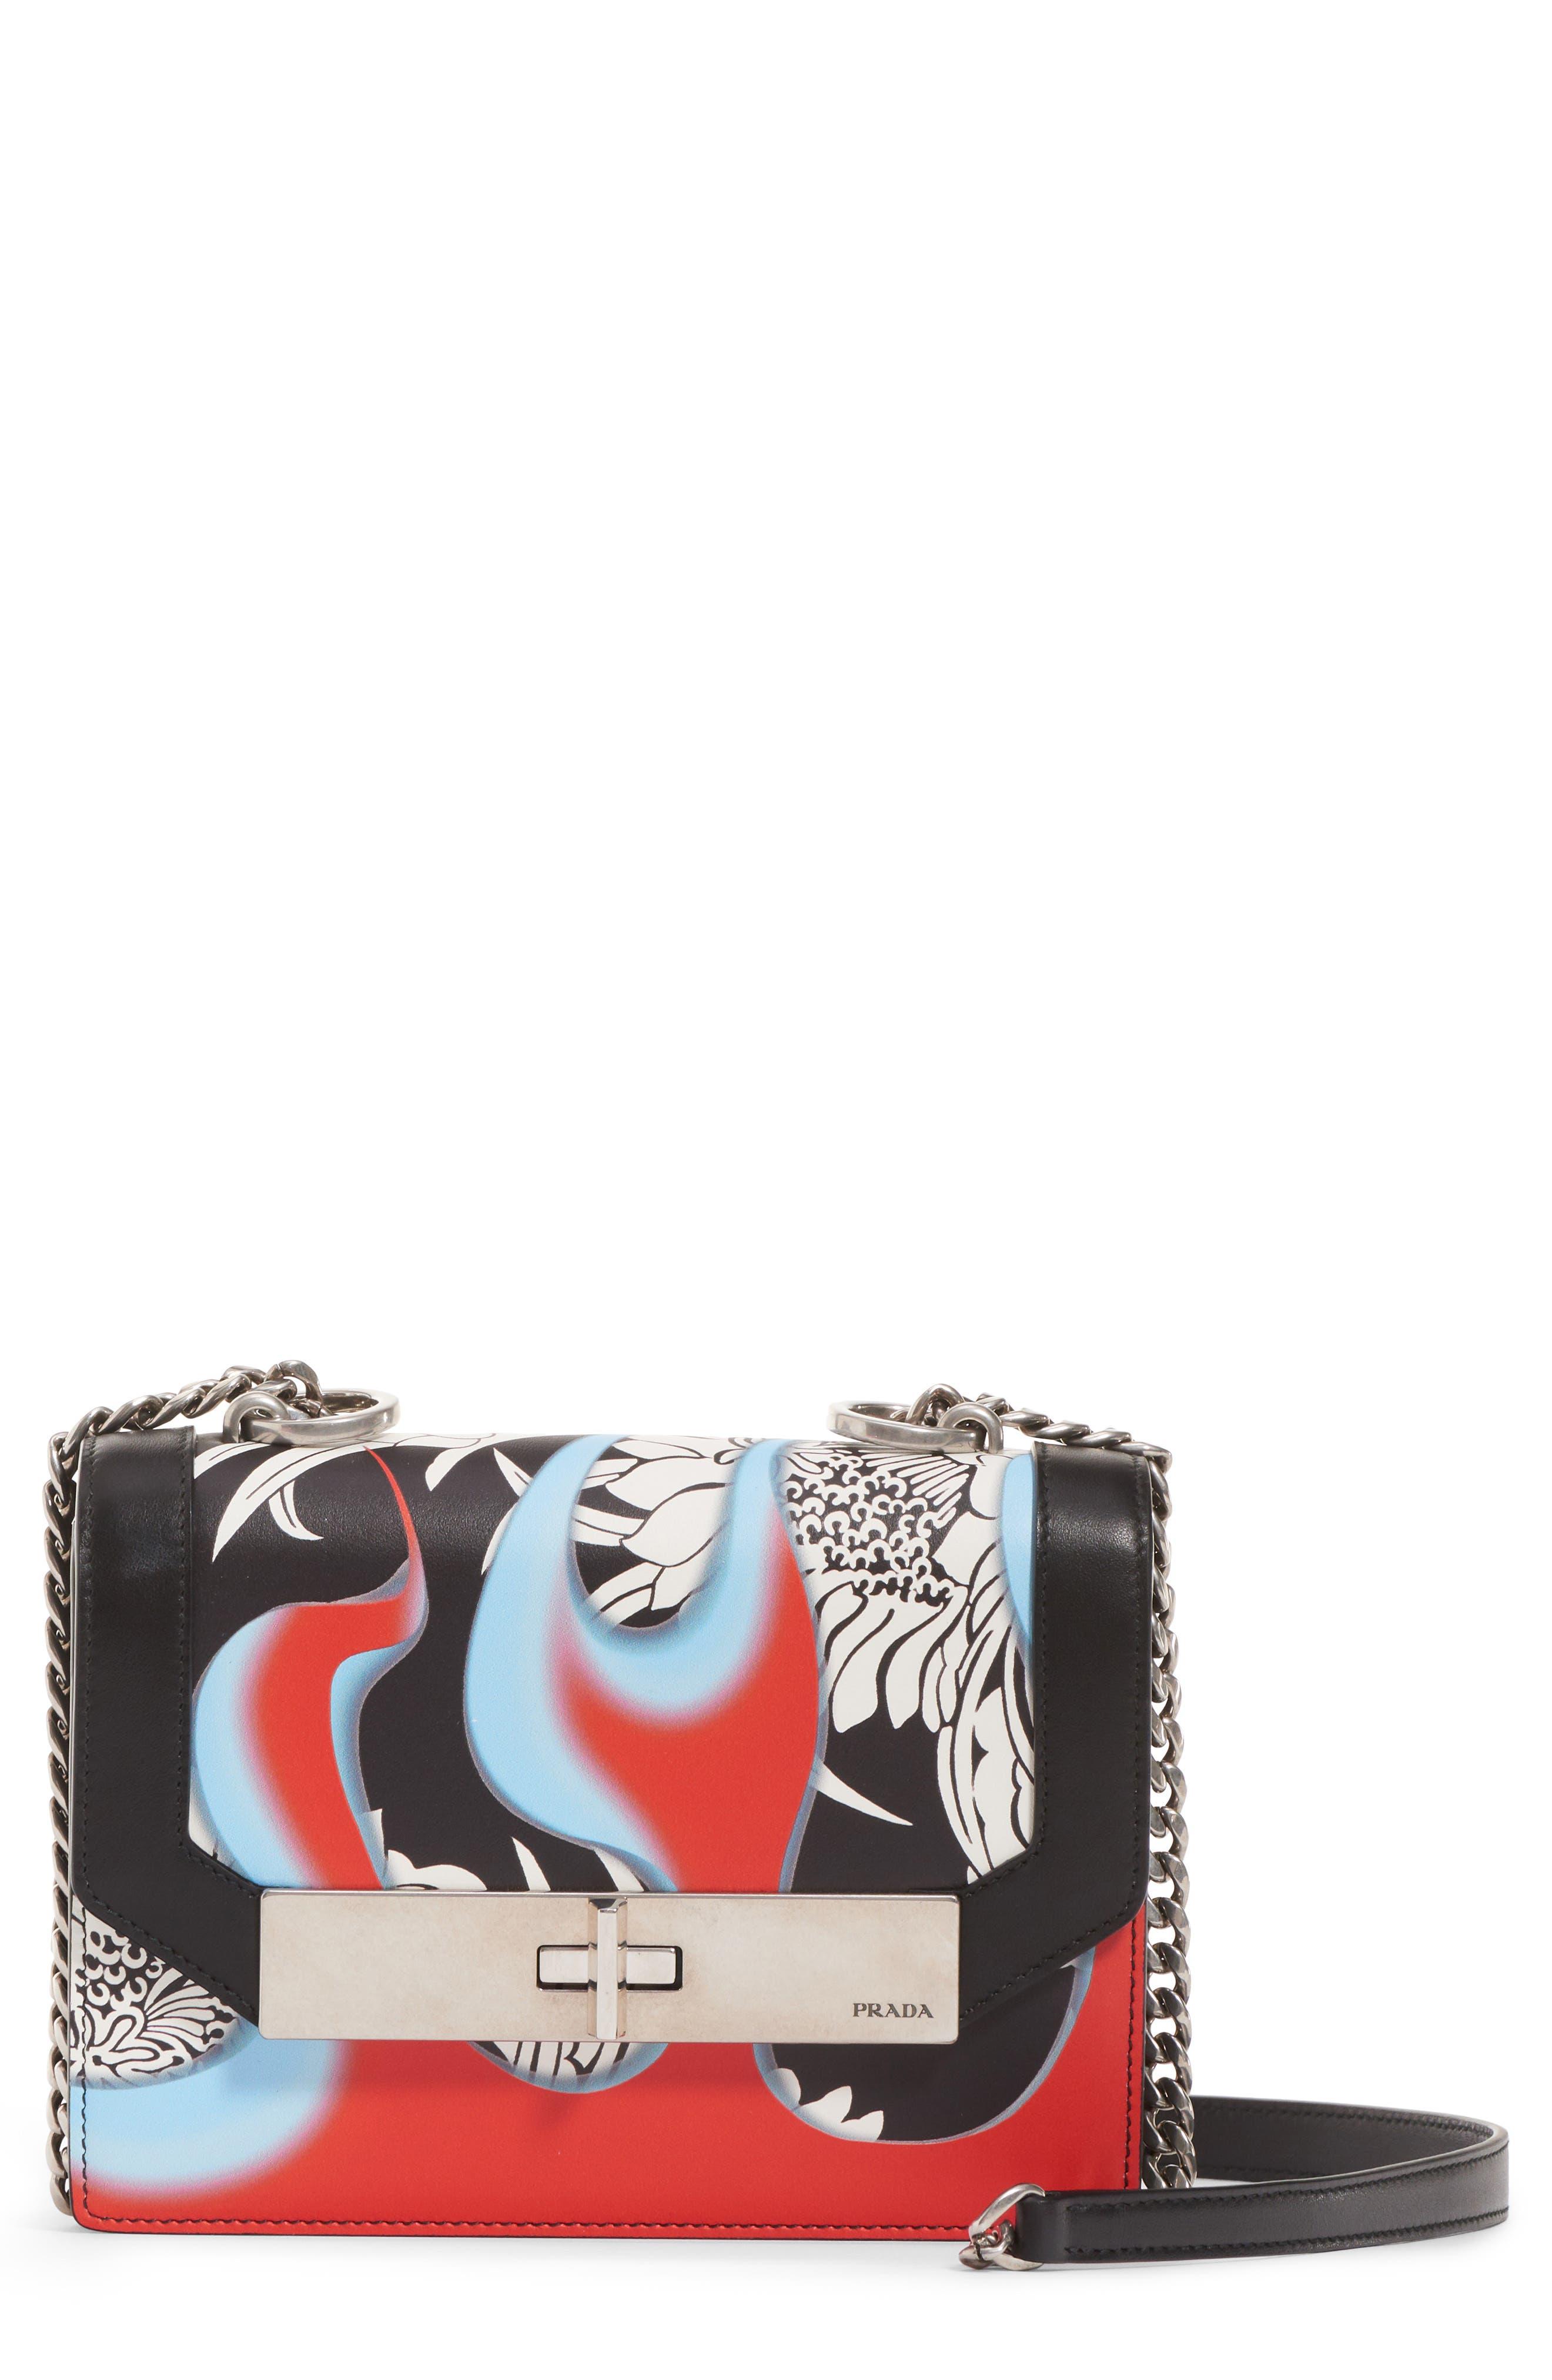 Print Leather Shoulder Bag,                         Main,                         color, NERO/ ROSSO